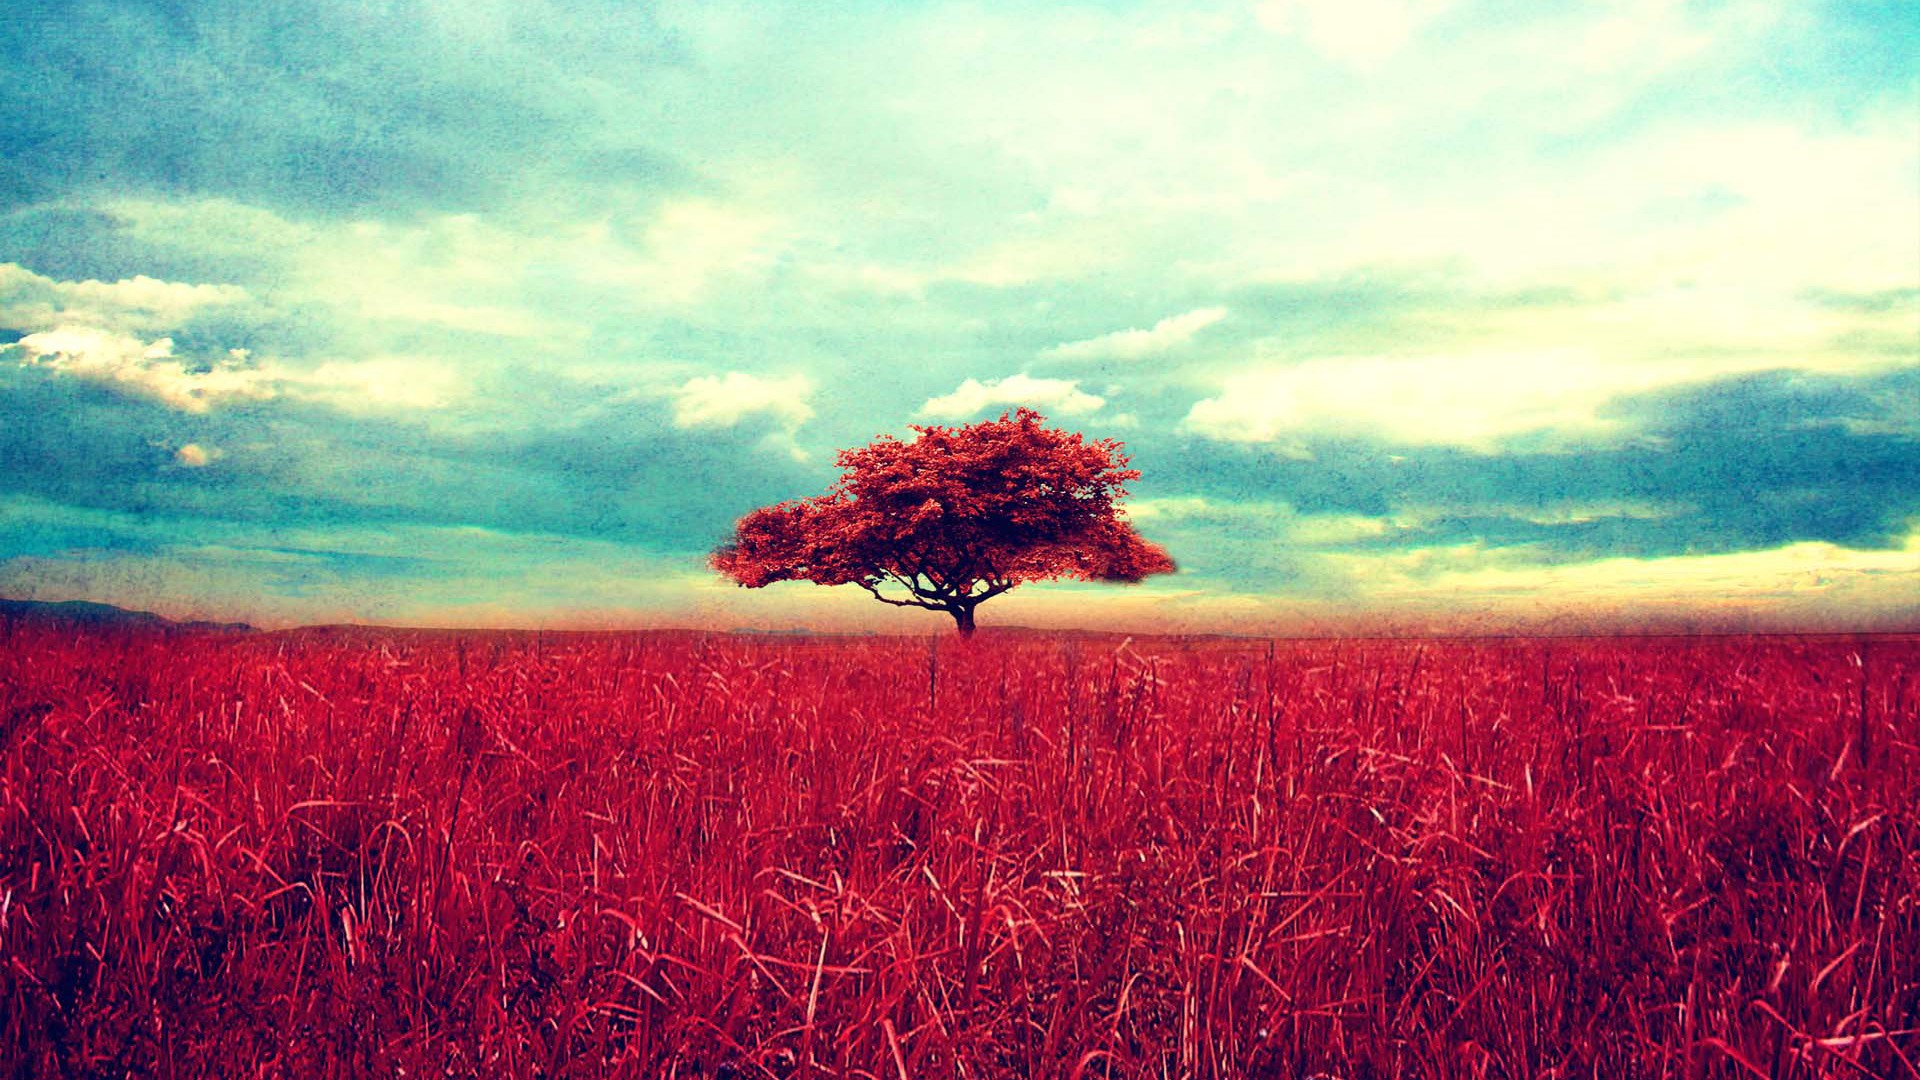 Nature Wallpapers Tumblr (74+)